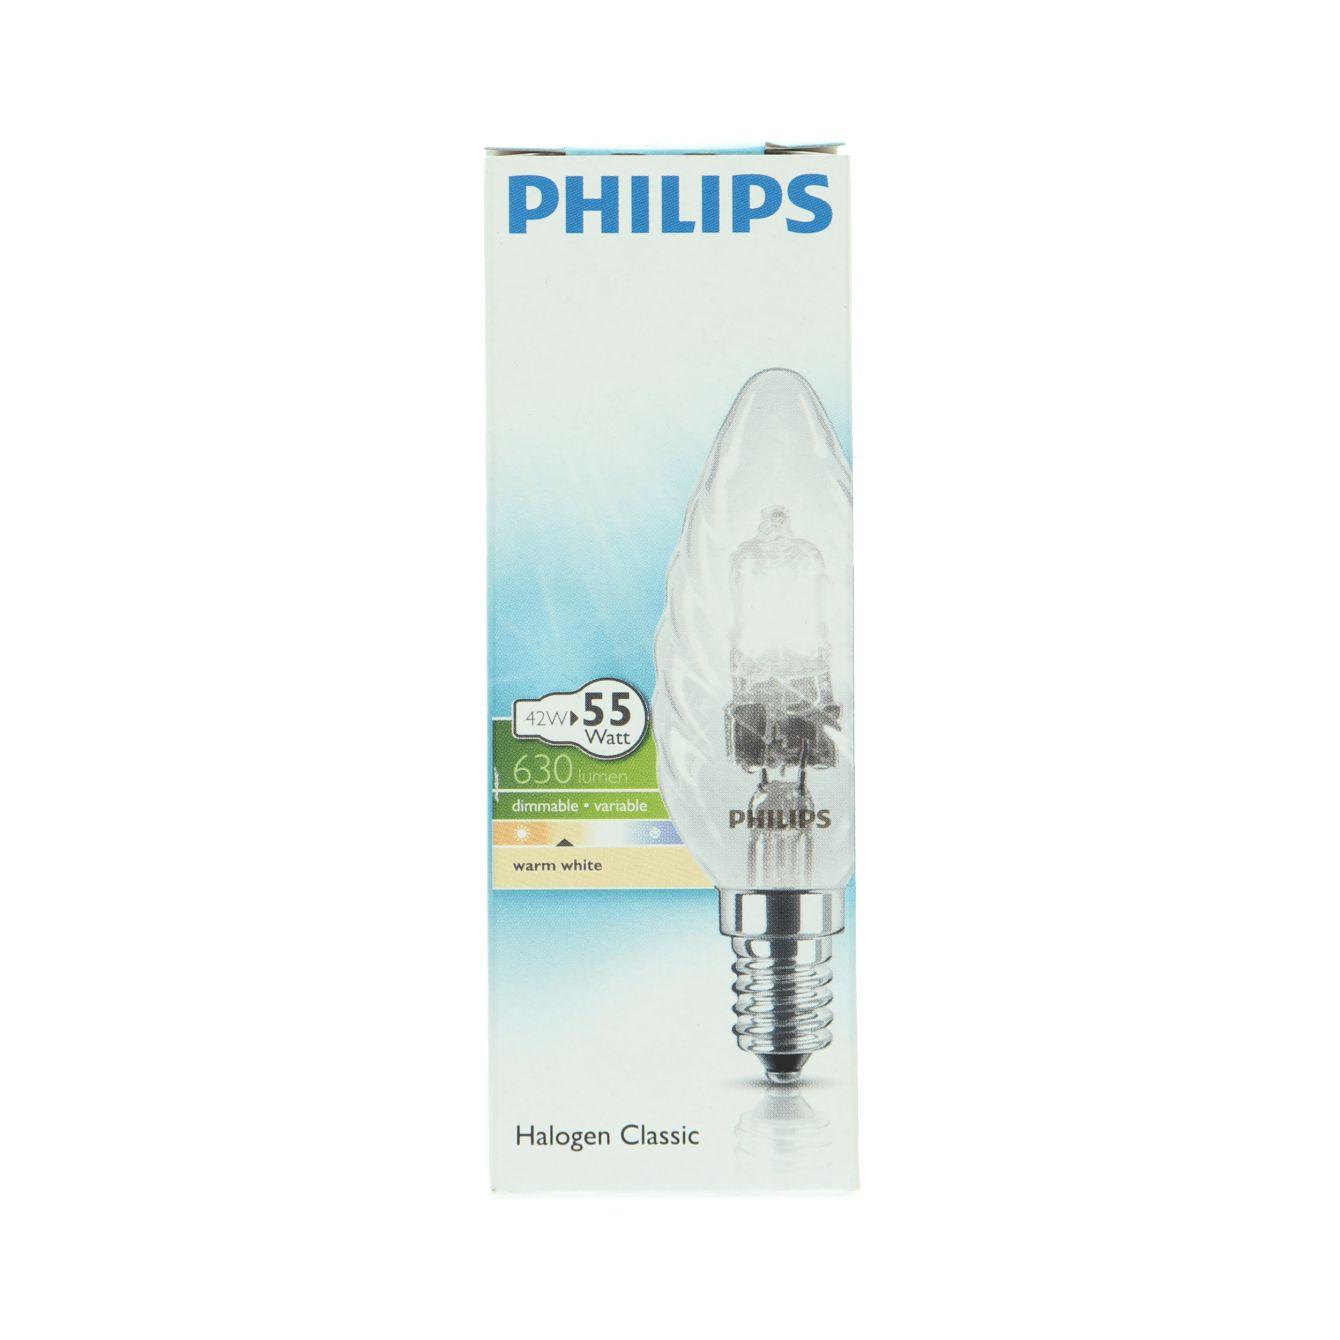 Philips Halogen 42w E14 230v Bw35